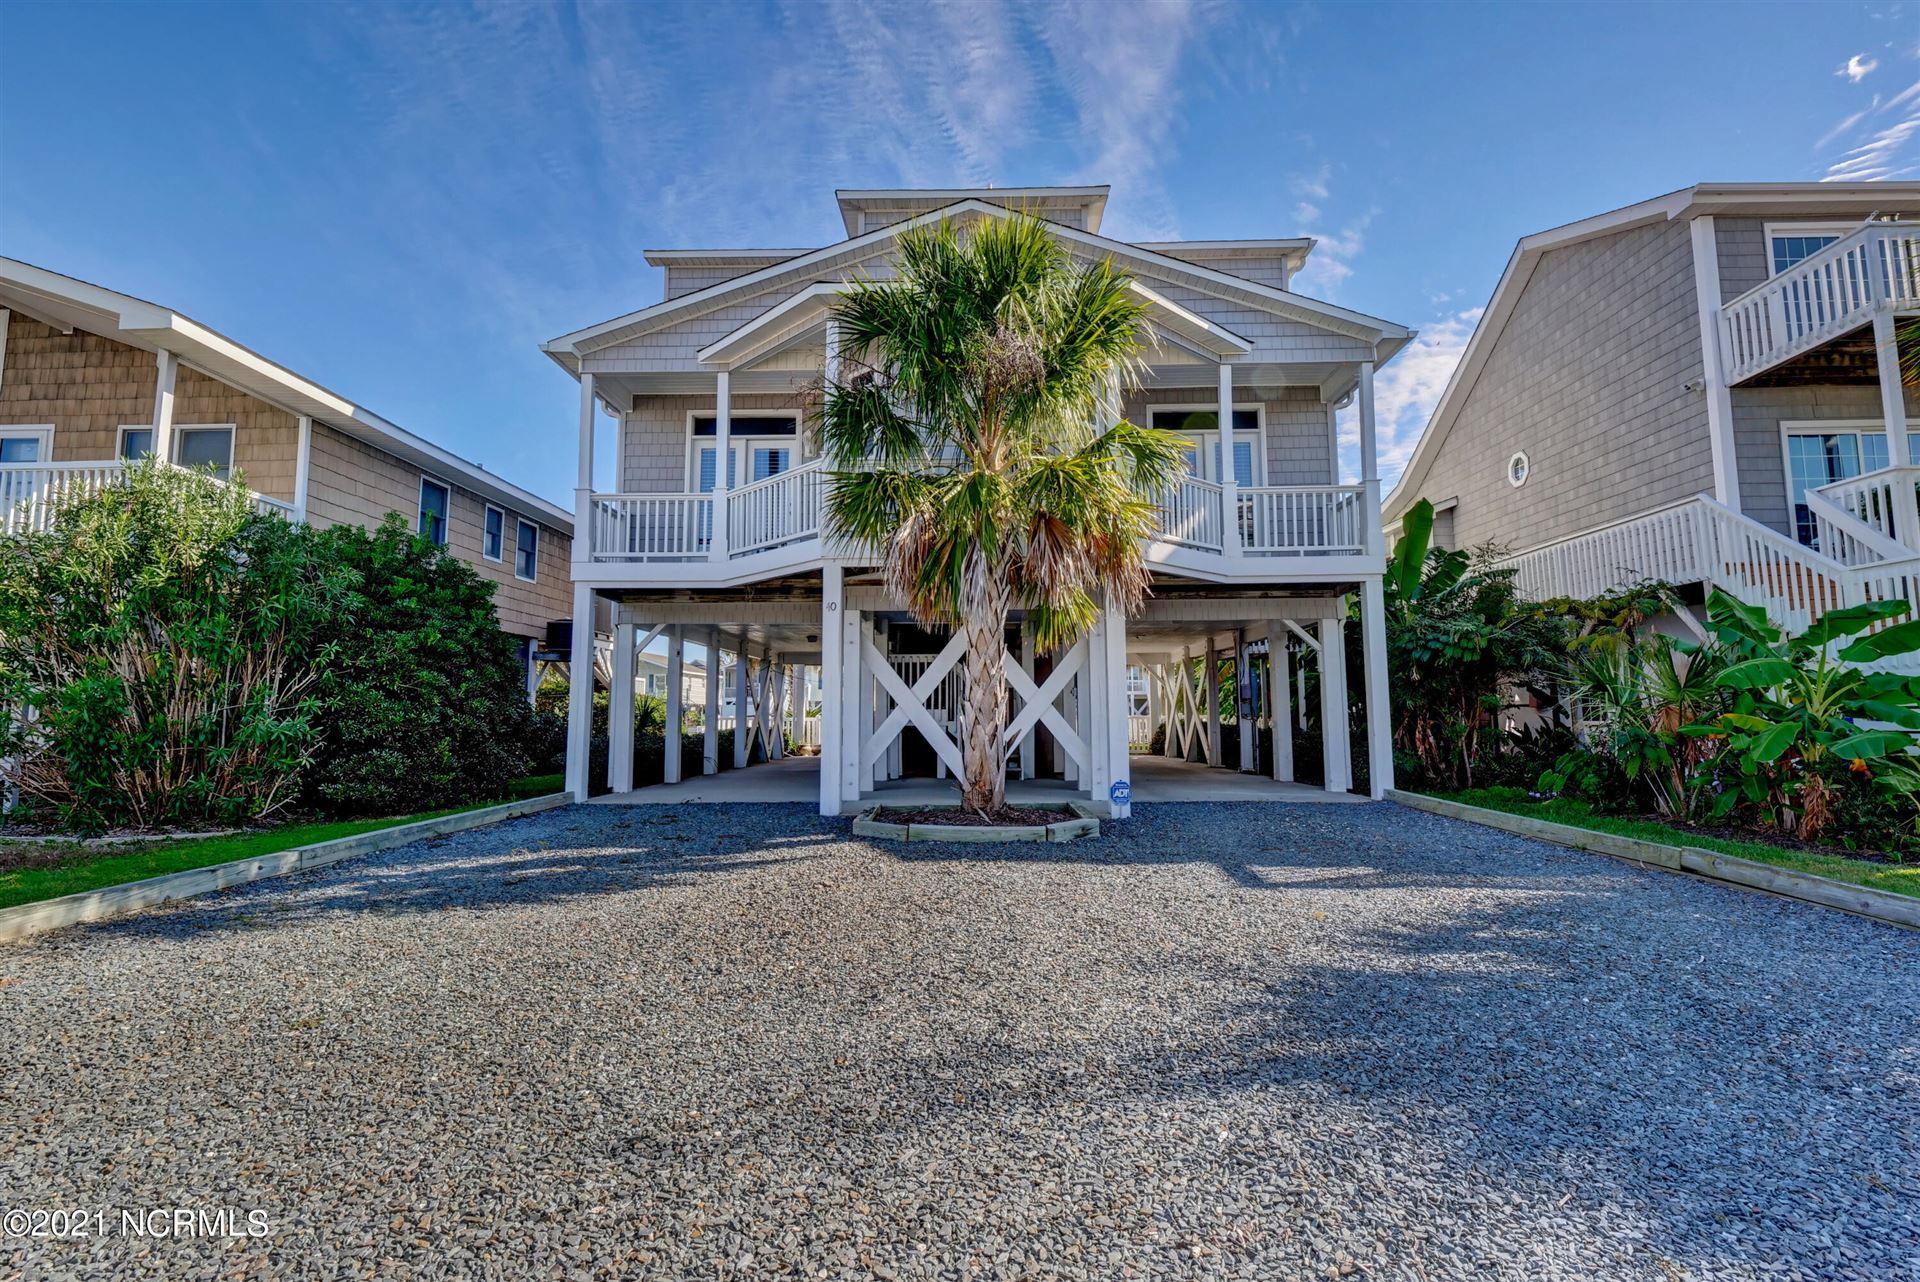 Photo of 40 Concord Street, Ocean Isle Beach, NC 28469 (MLS # 100296049)